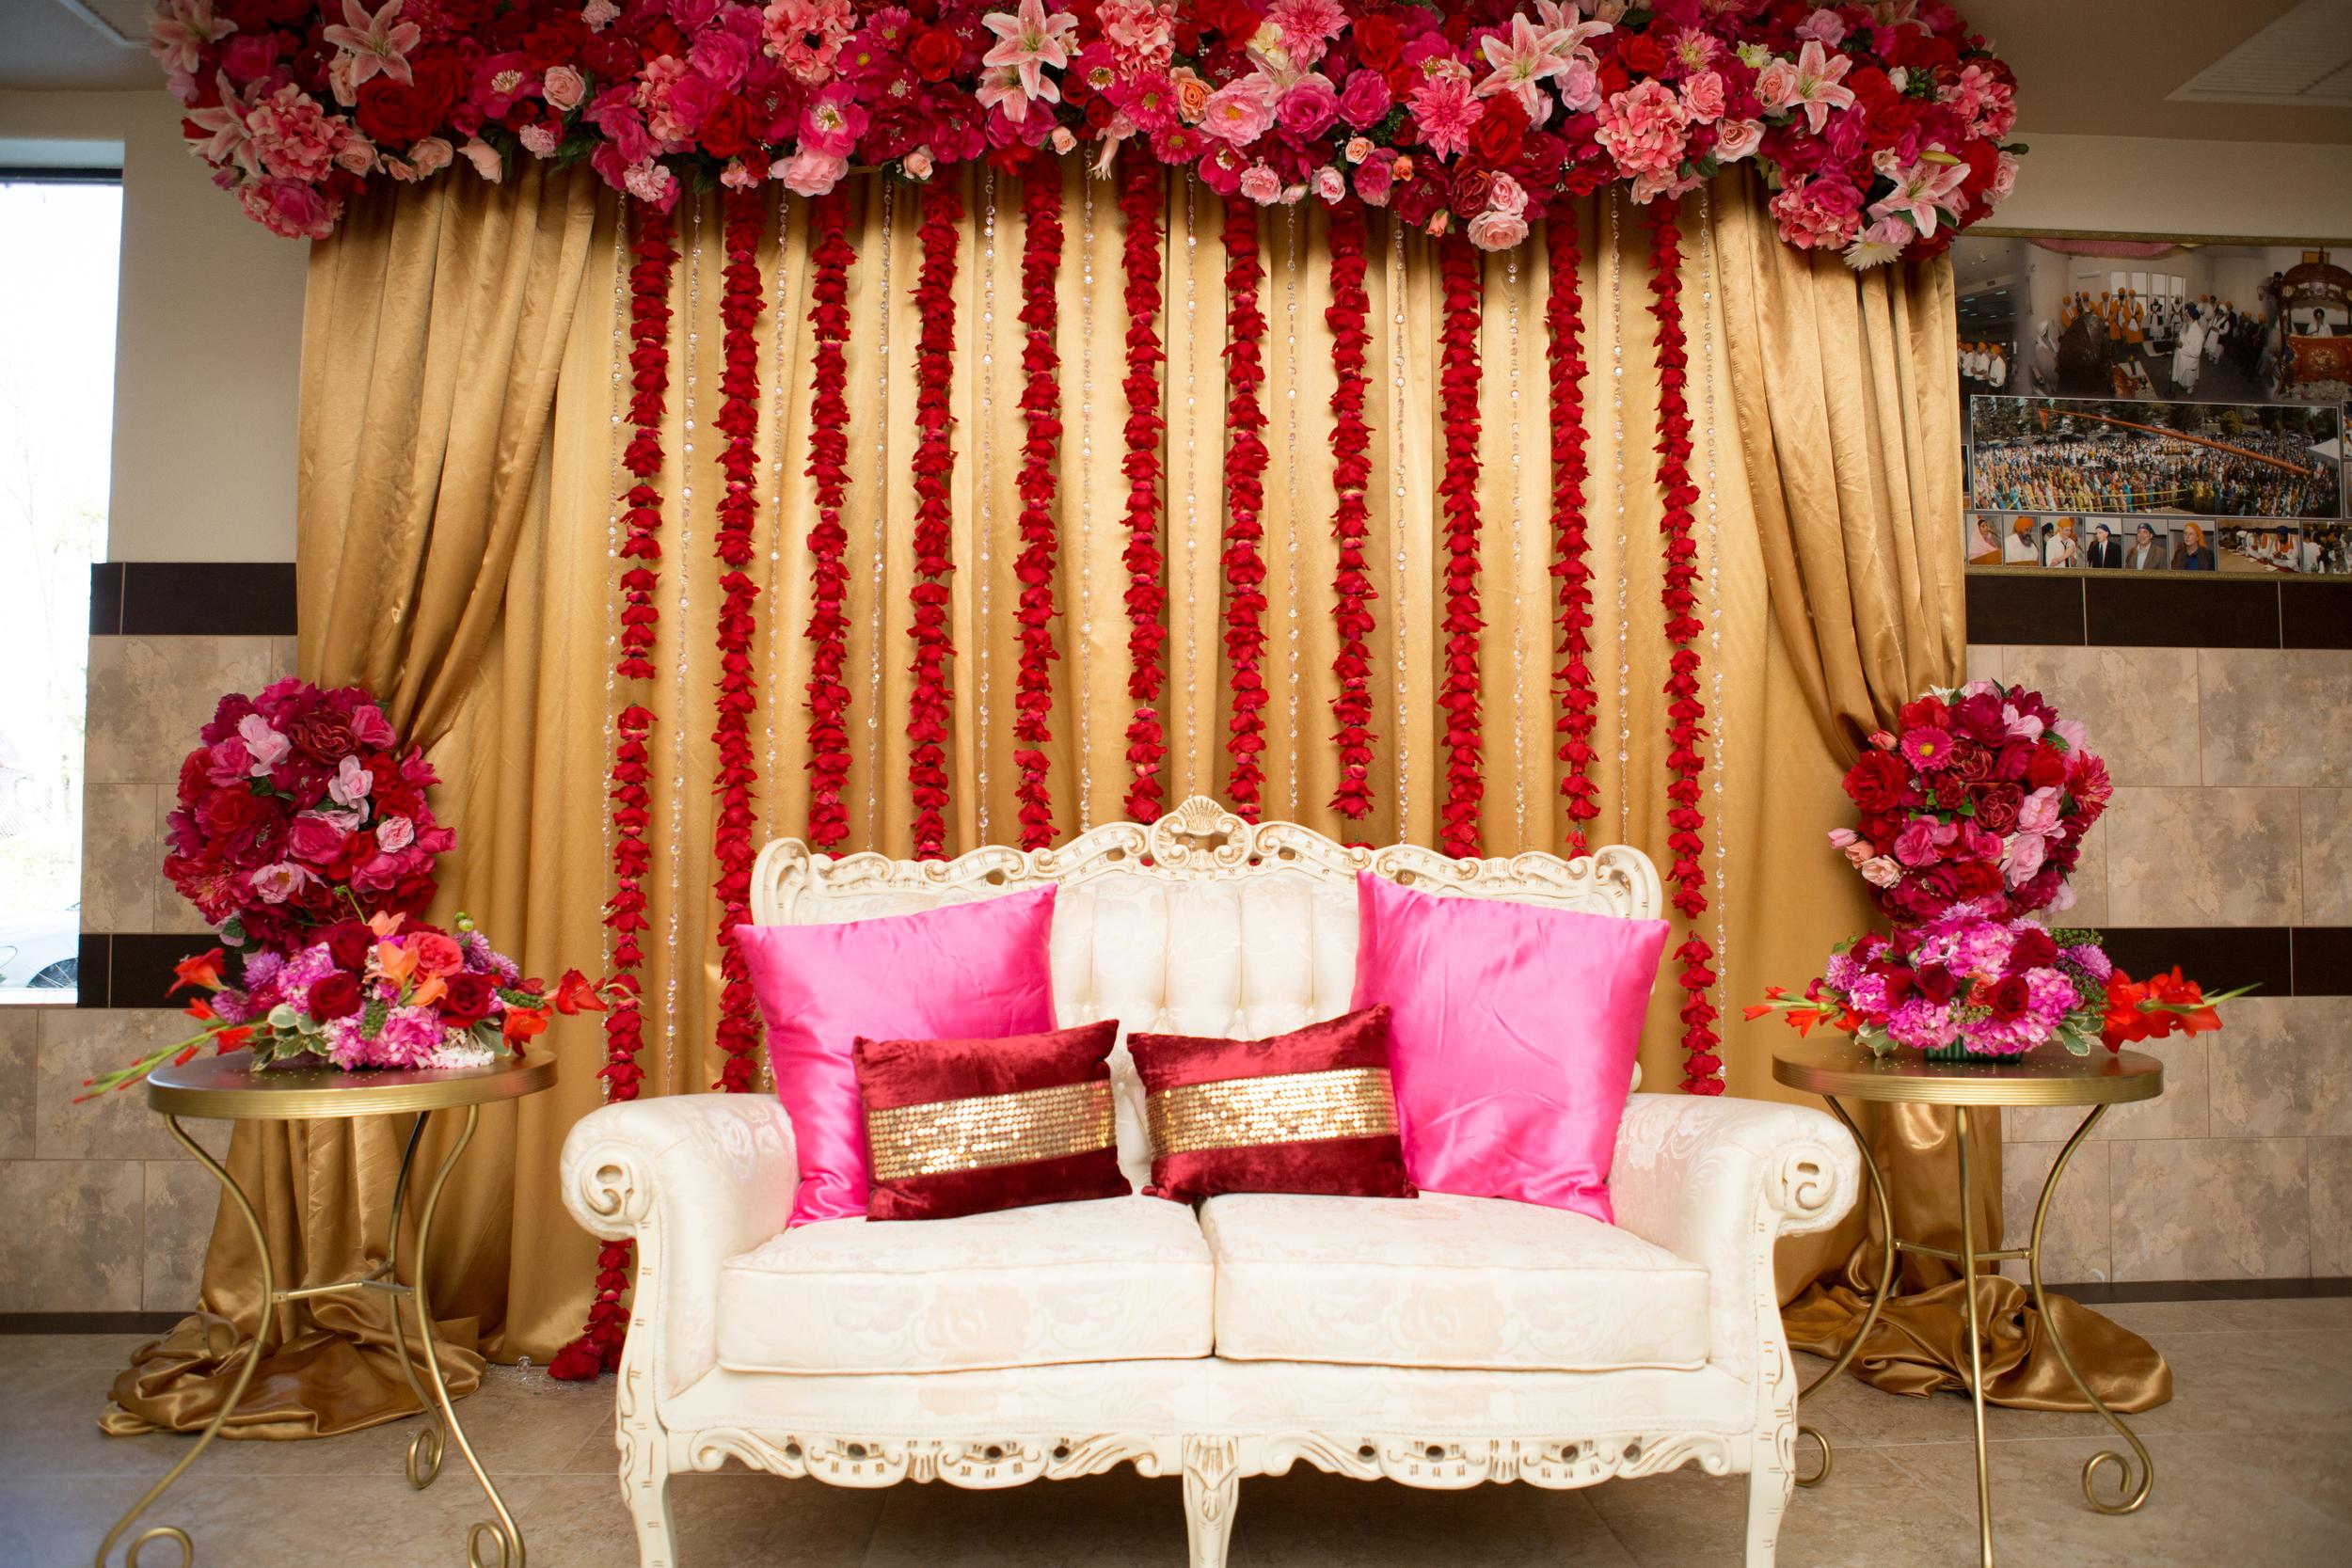 LovestoryPictures_AnaisEvents_Baljit_Ceremony - 38.jpg